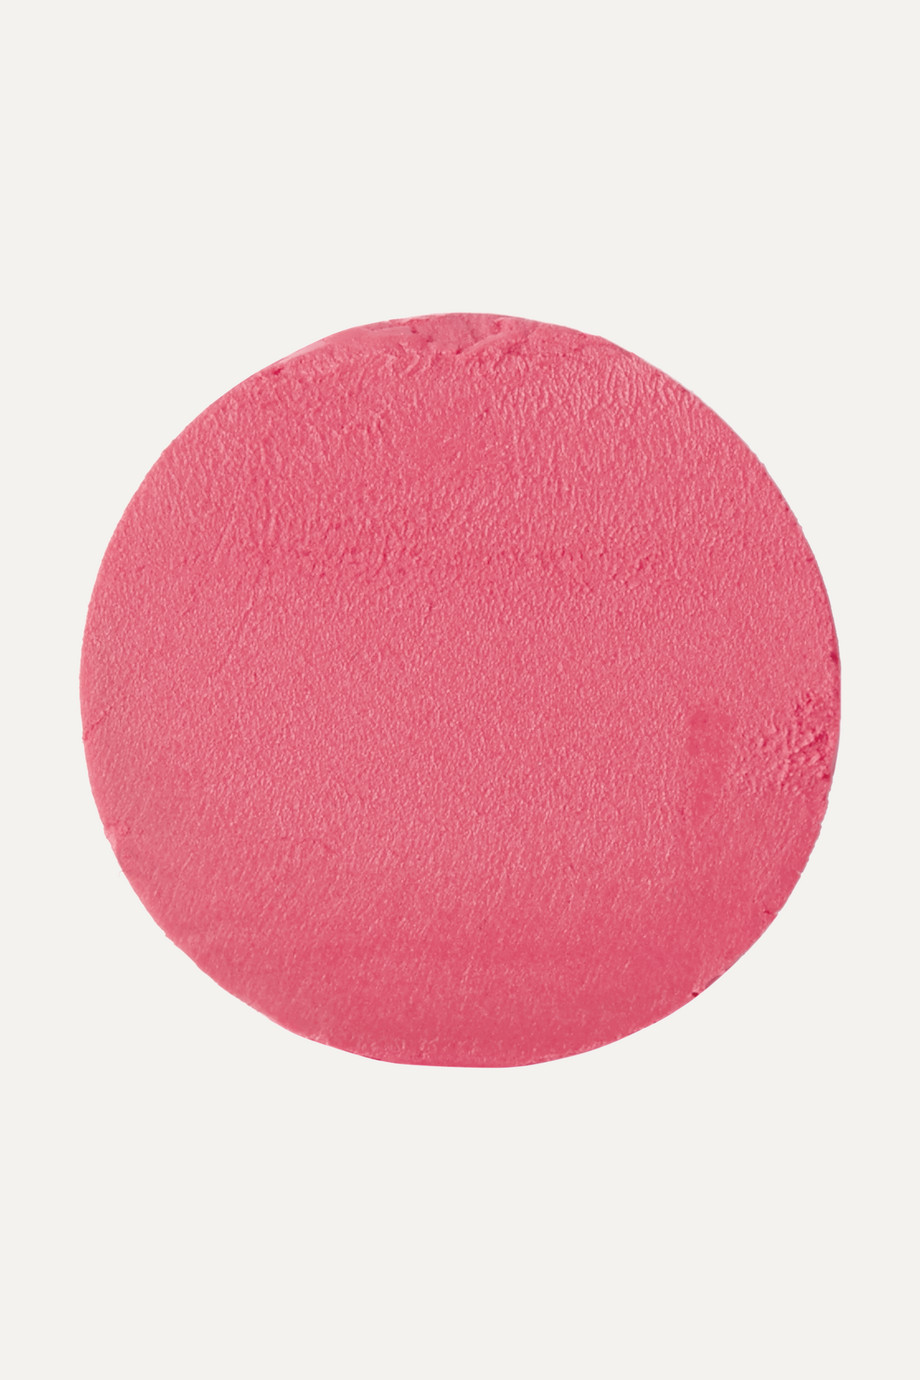 Charlotte Tilbury Matte Revolution Lipstick - Amazing Grace